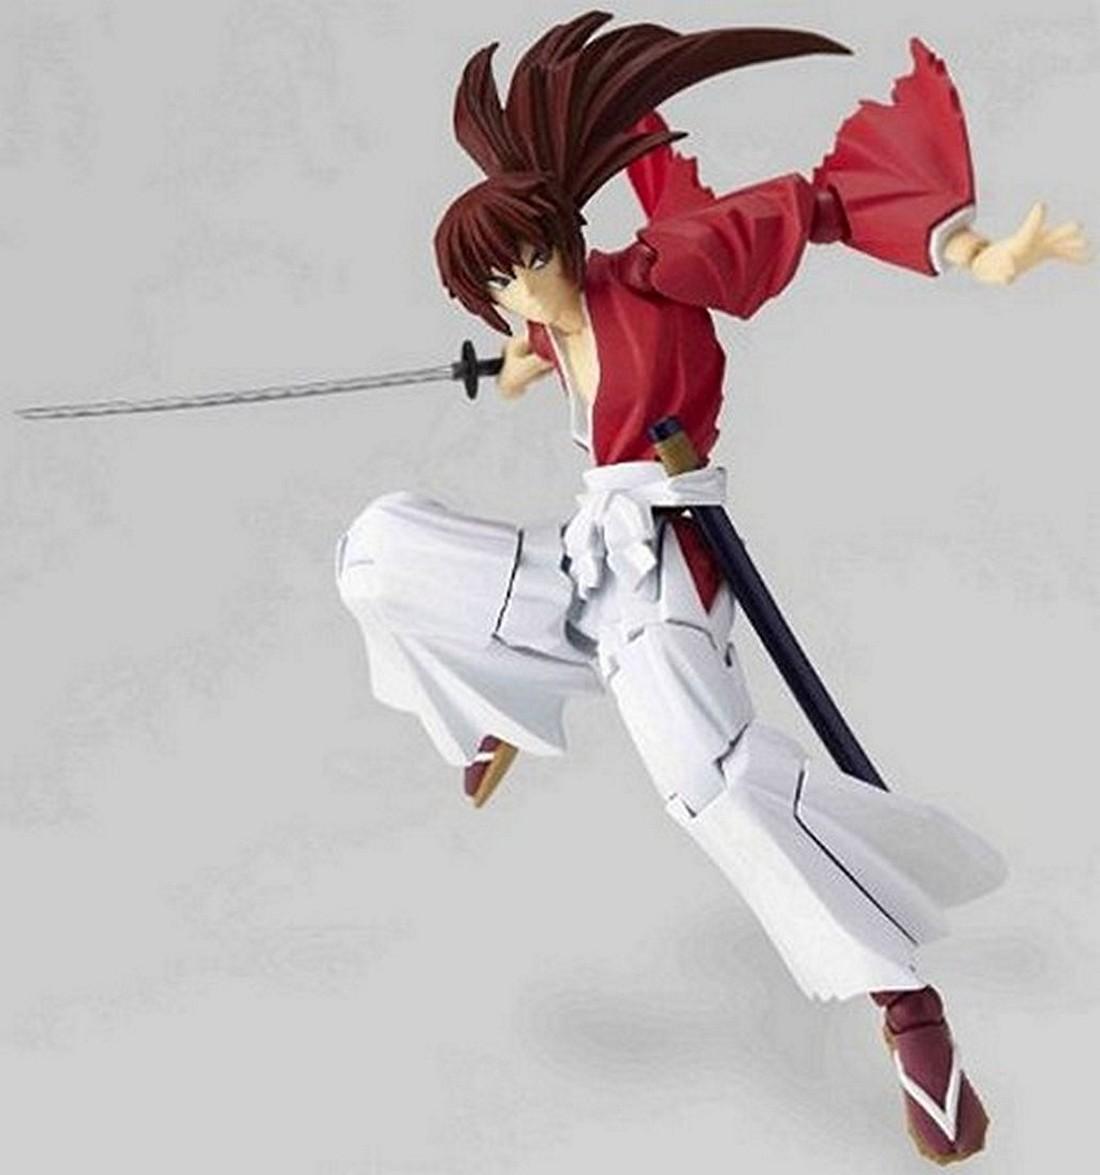 Rurouni Kenshin: Rurouni Kenshin Revoltech Super Poseable Action Figure 109